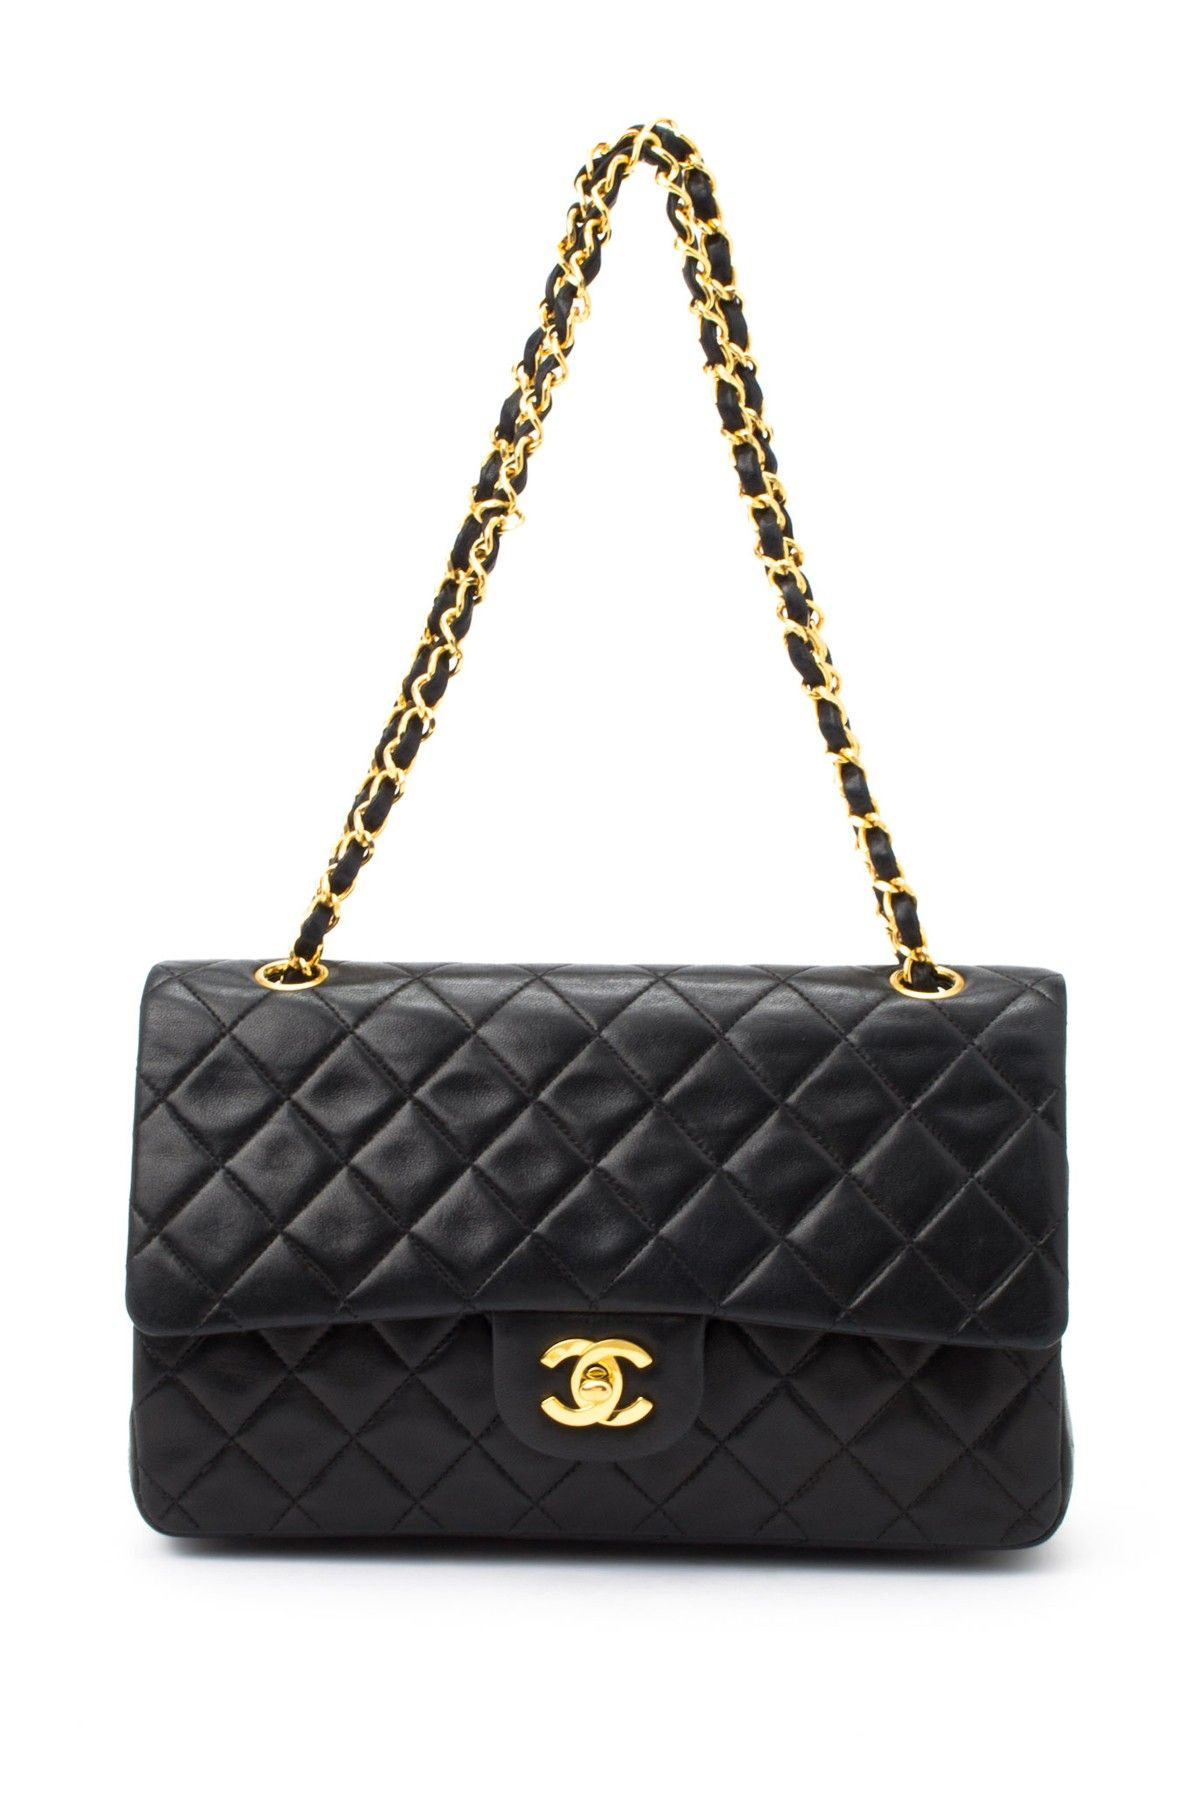 318dcaf0261 Vintage Chanel Lambskin Matelasse Double Chain Shoulder Bag on HauteLook